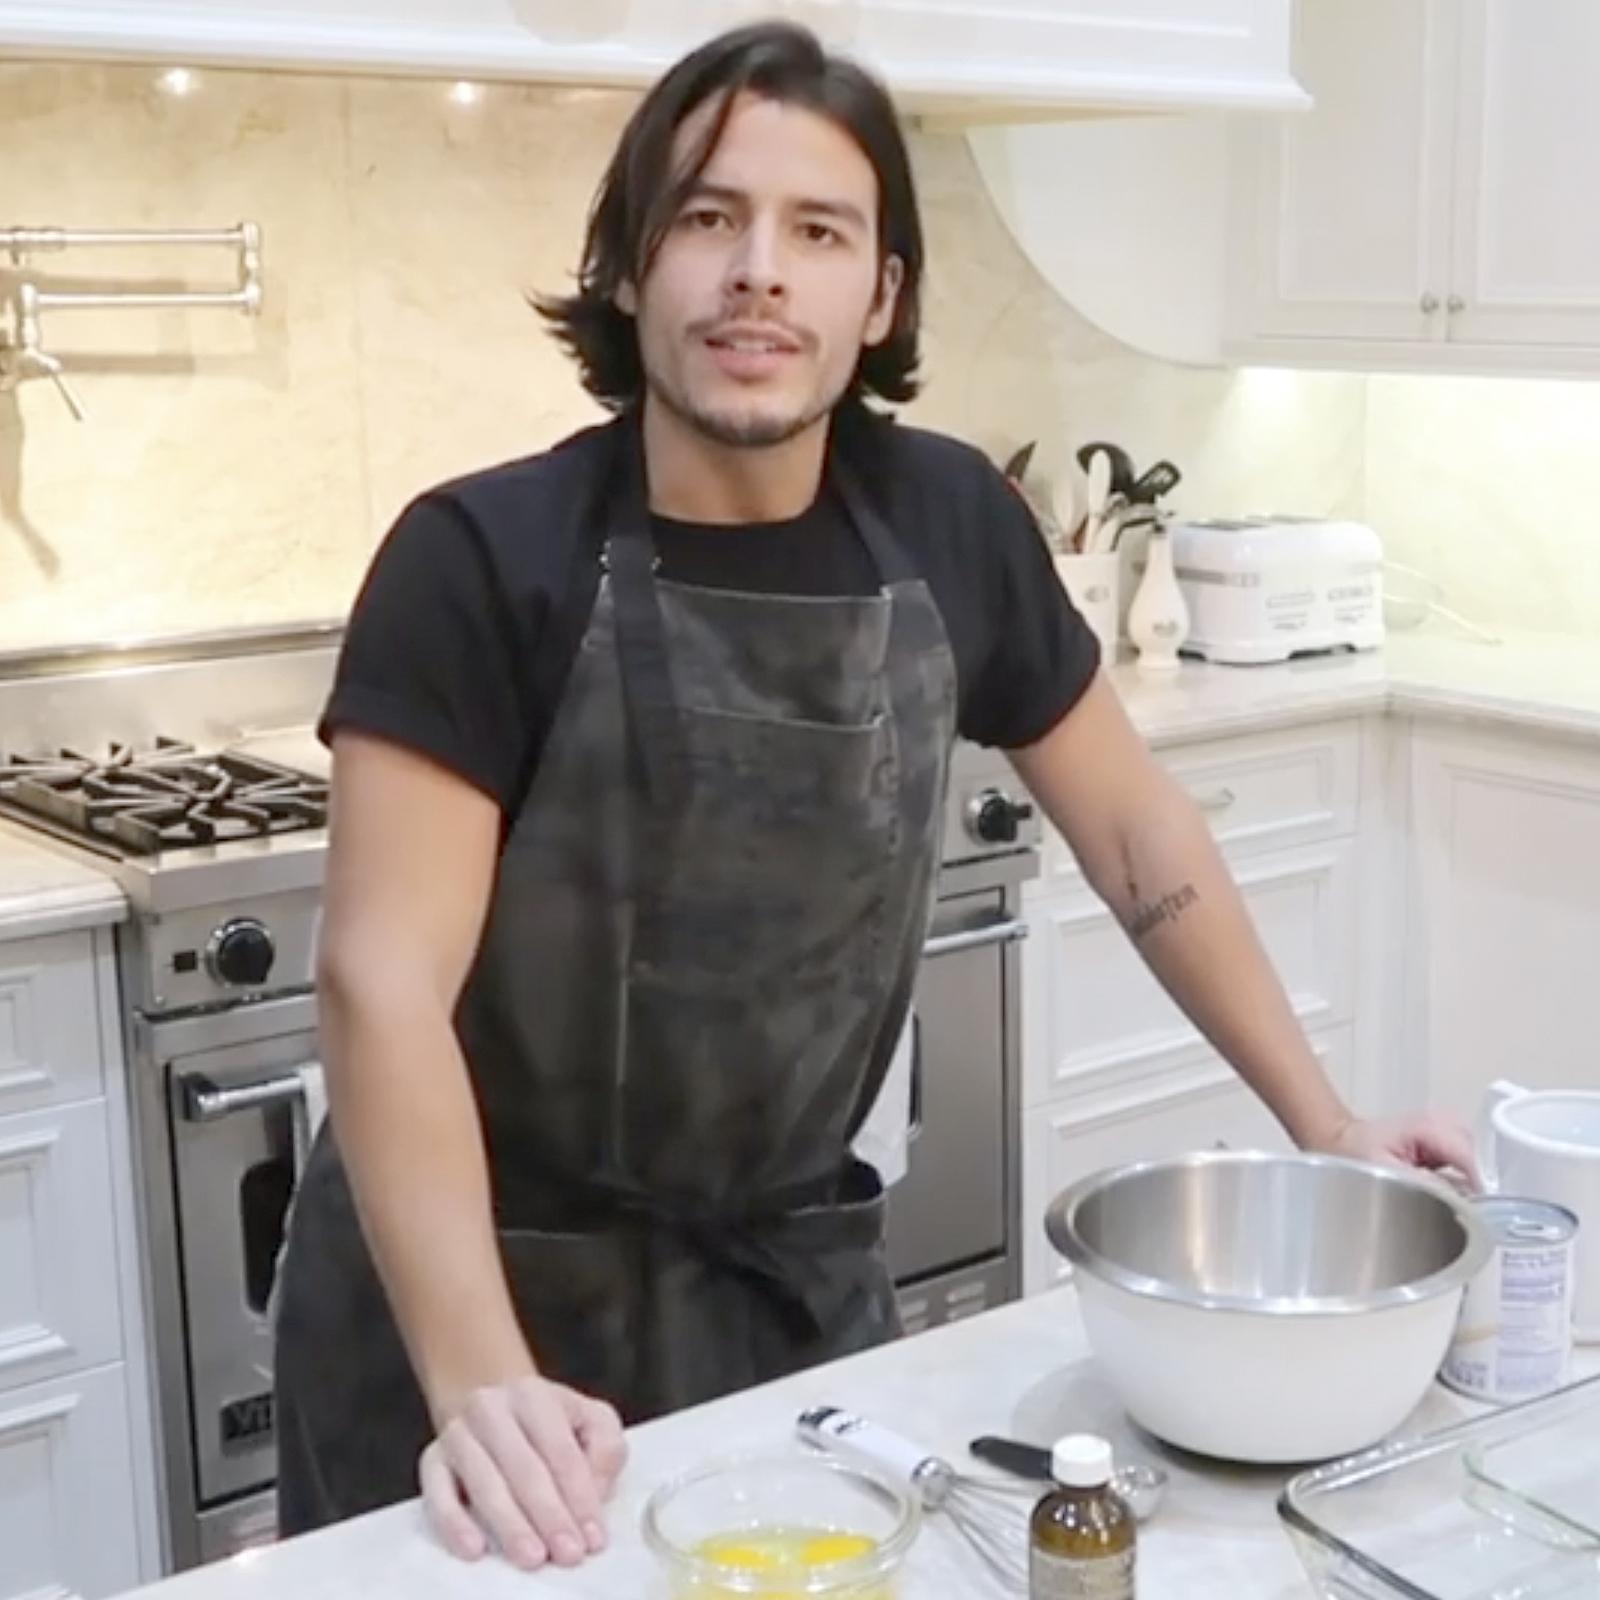 Manolo González hijo de Sofía Vergara cocinando